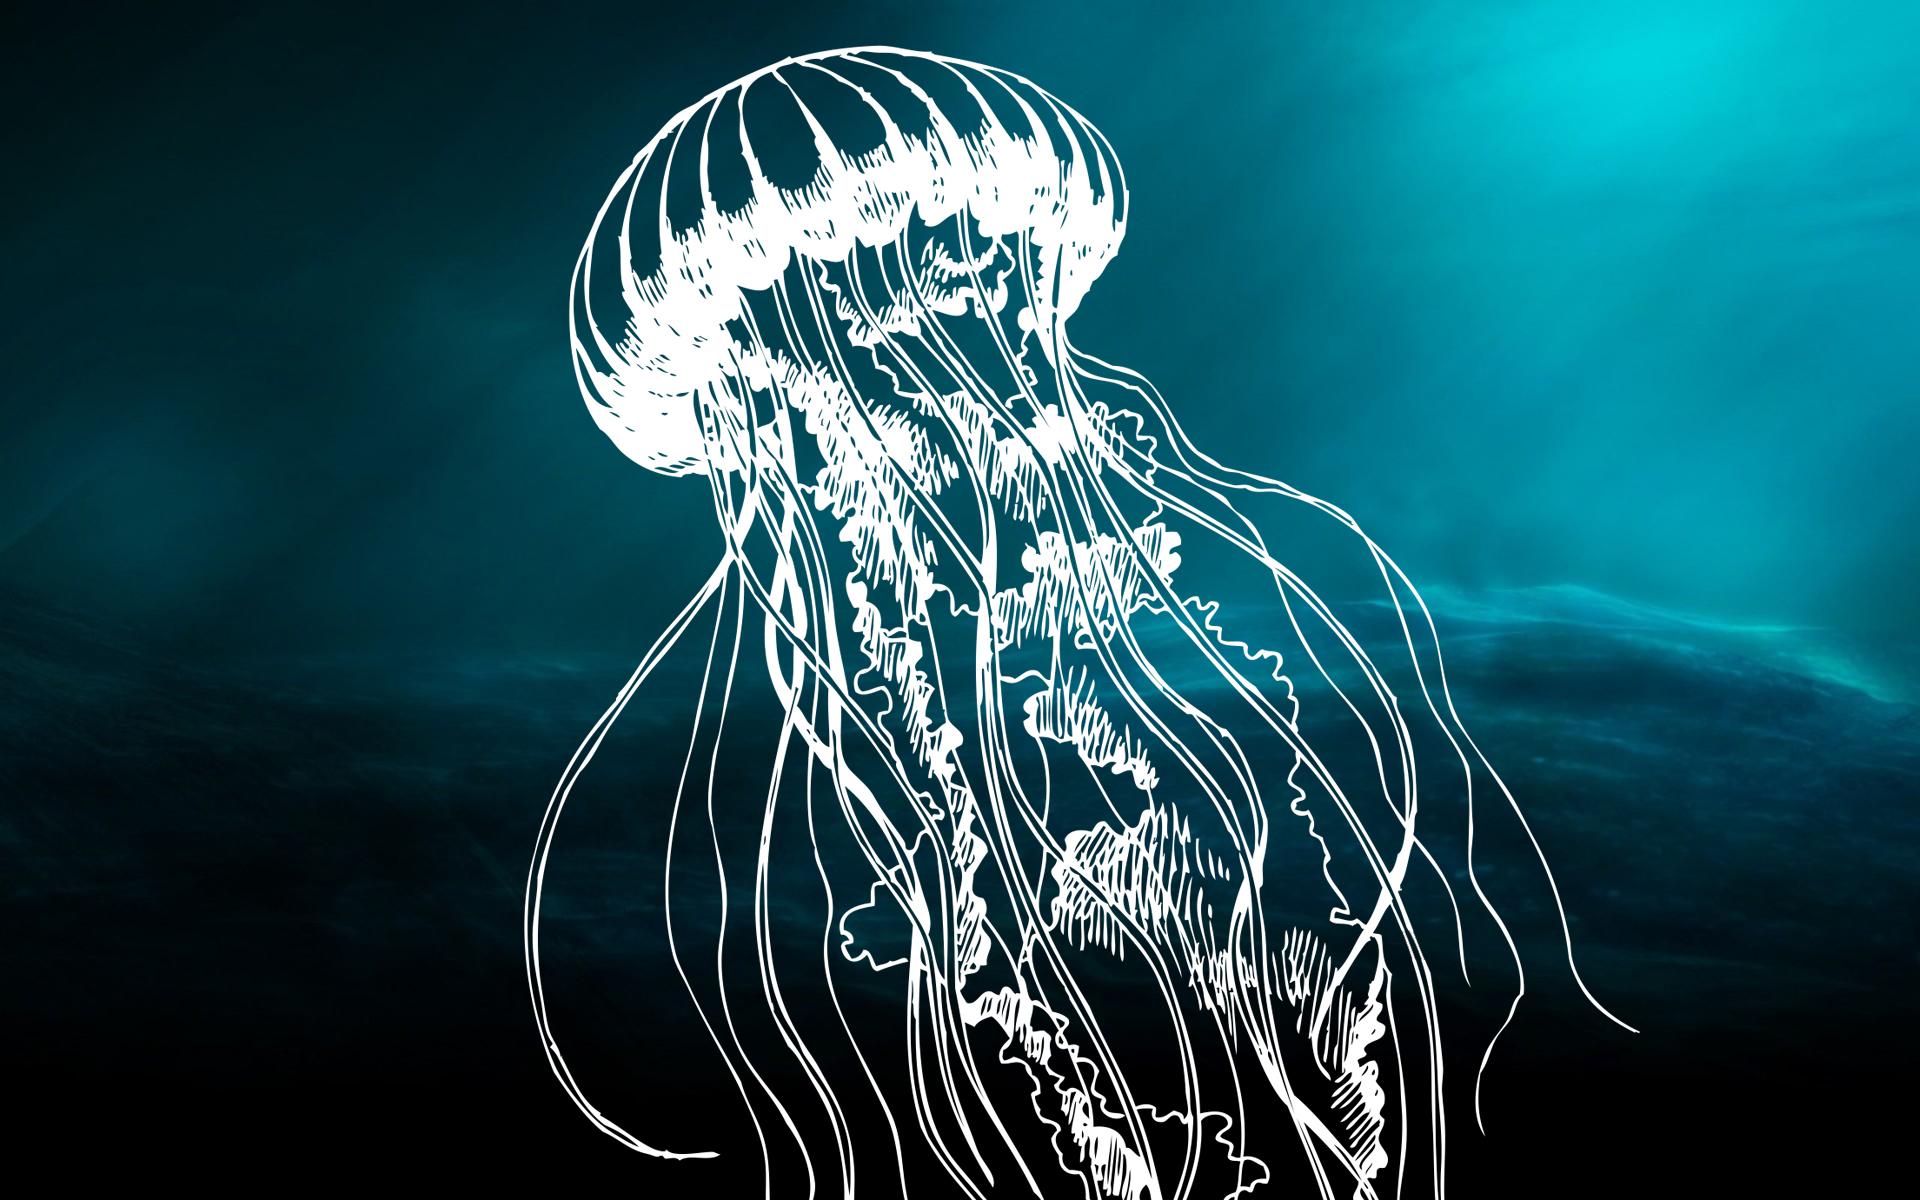 fundo do mar_1